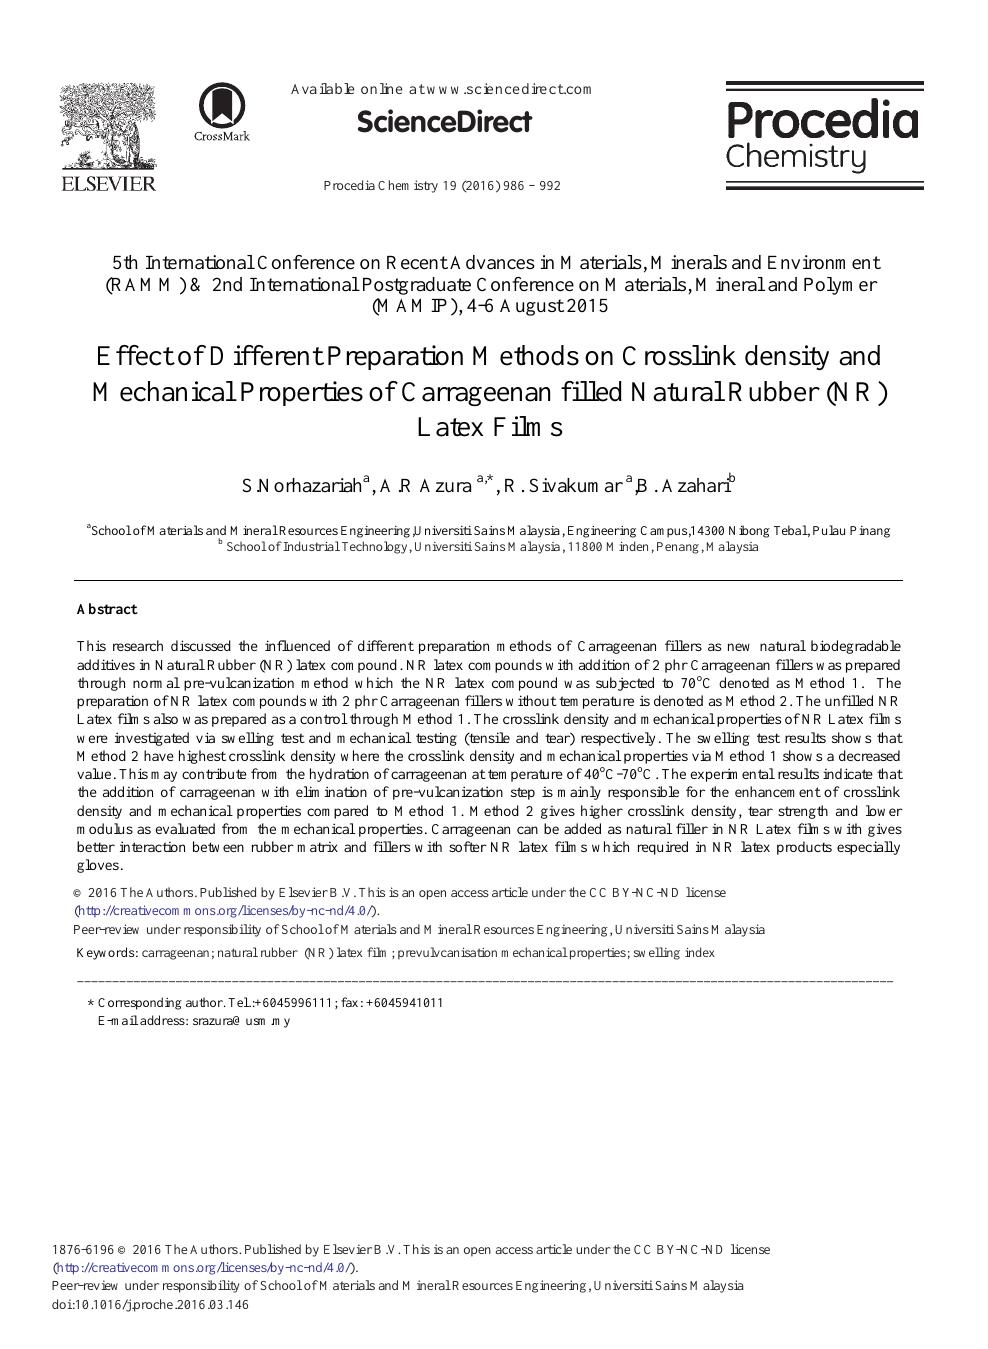 Effect of Different Preparation Methods on Crosslink density